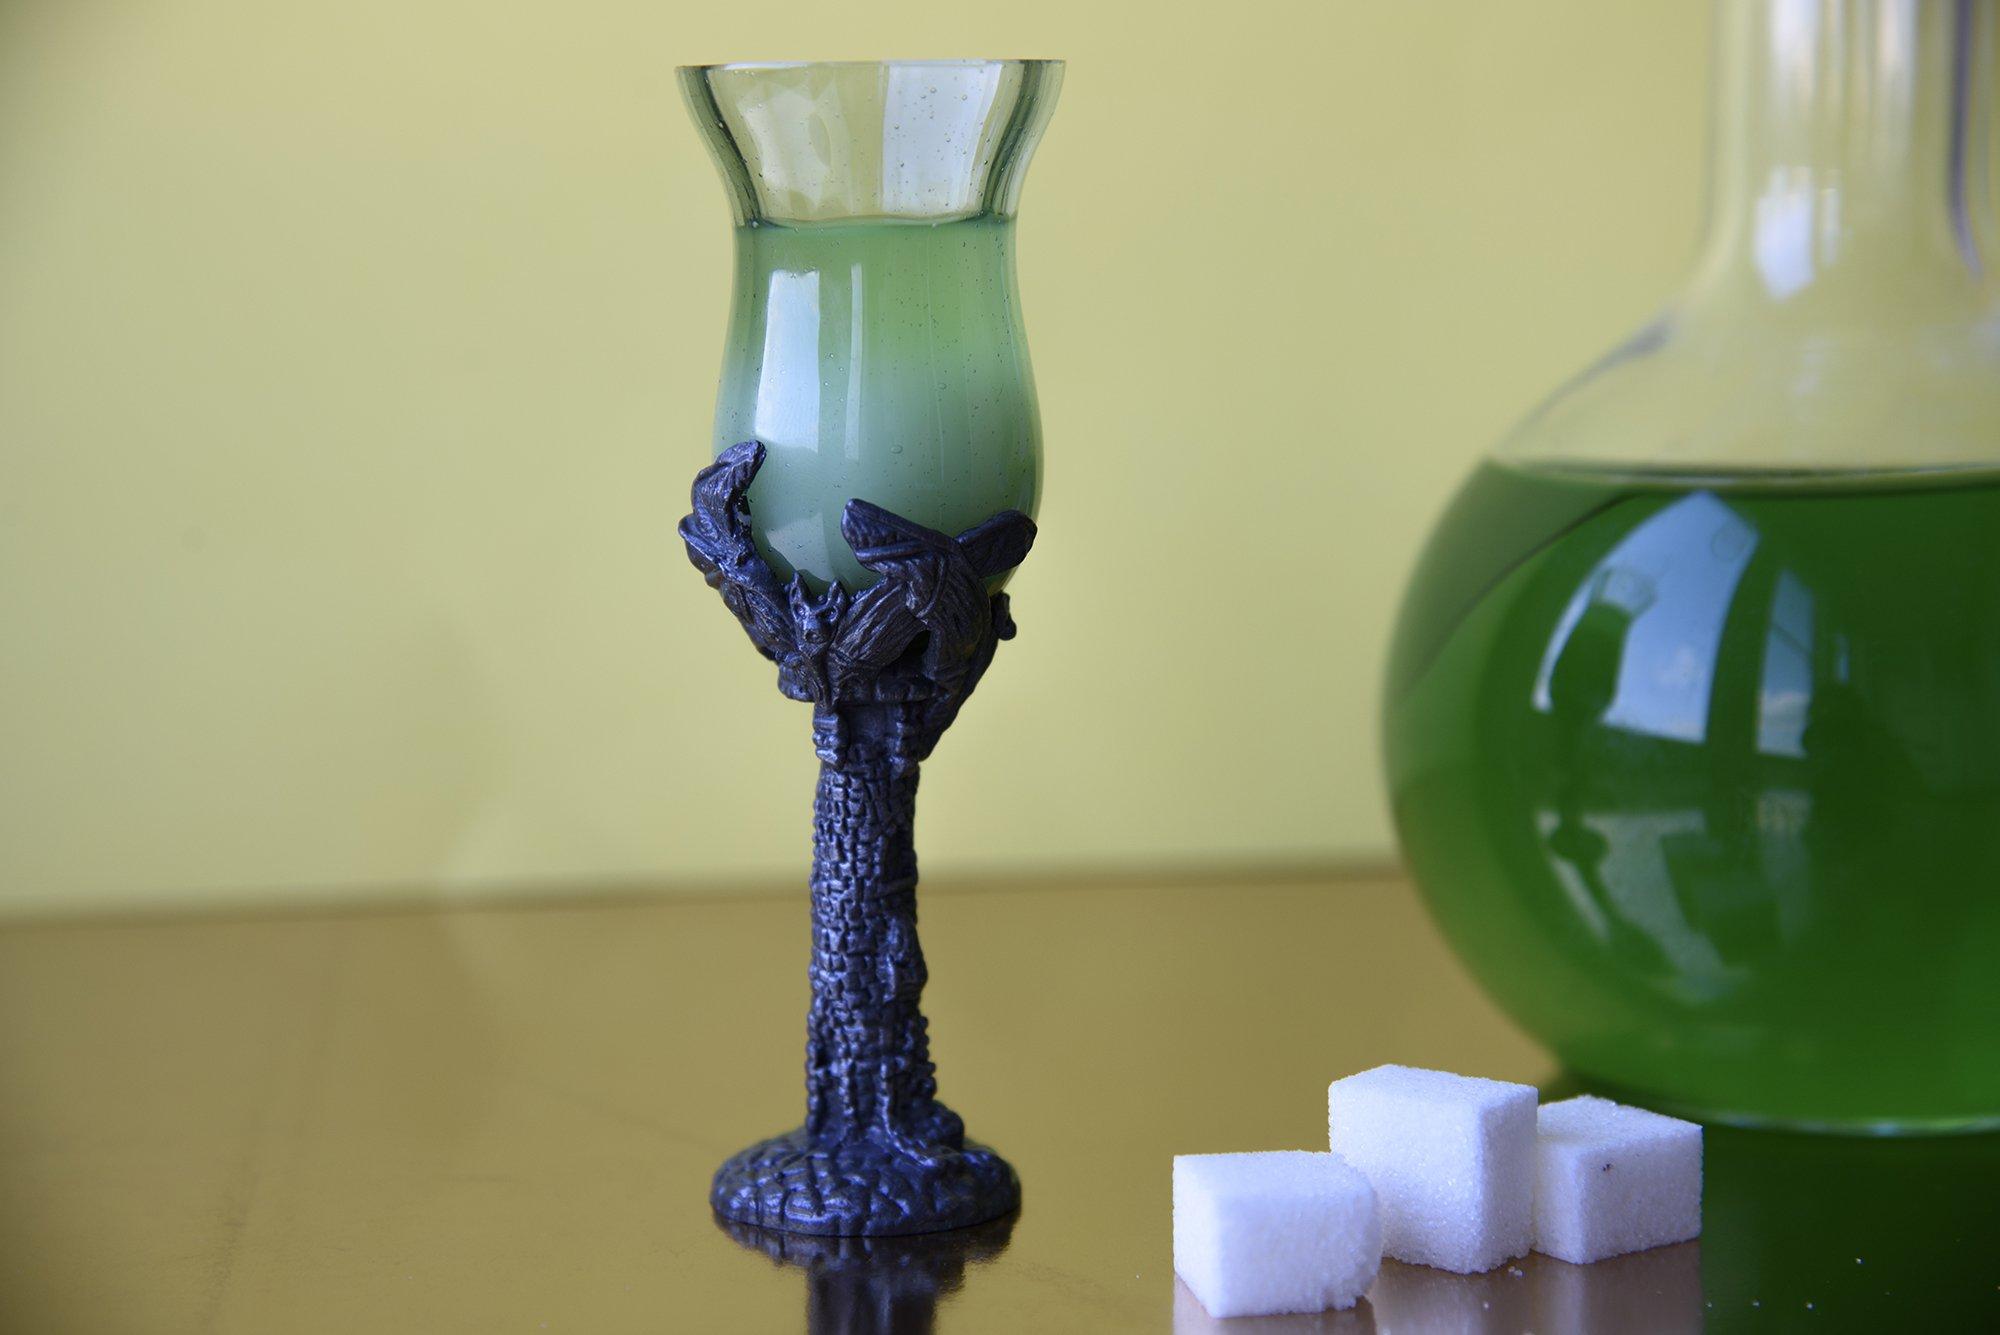 абсент, алкоголь, напиток, полынь, сахар, Svetlana Khromova